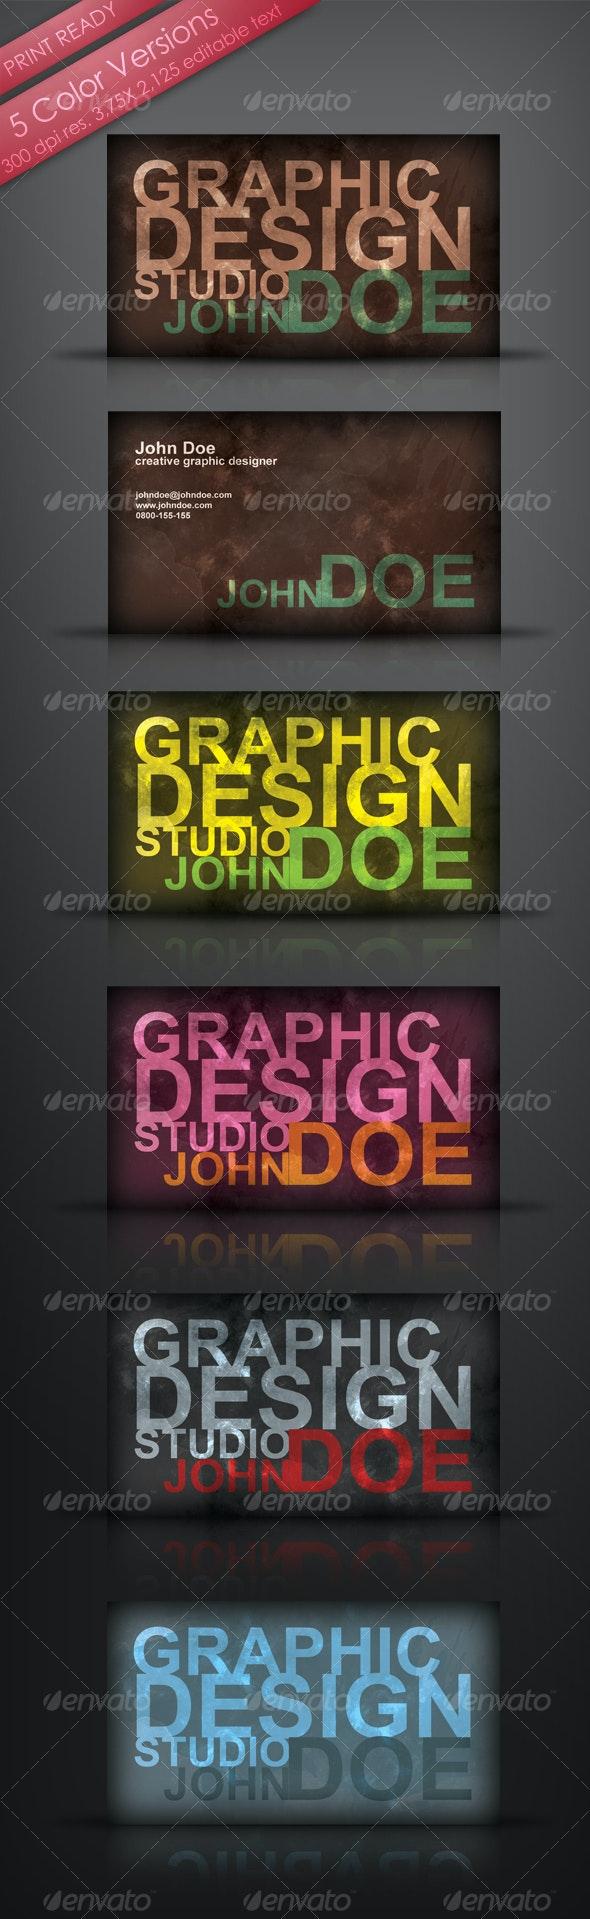 Grungy Designer's Business Card - Grunge Business Cards